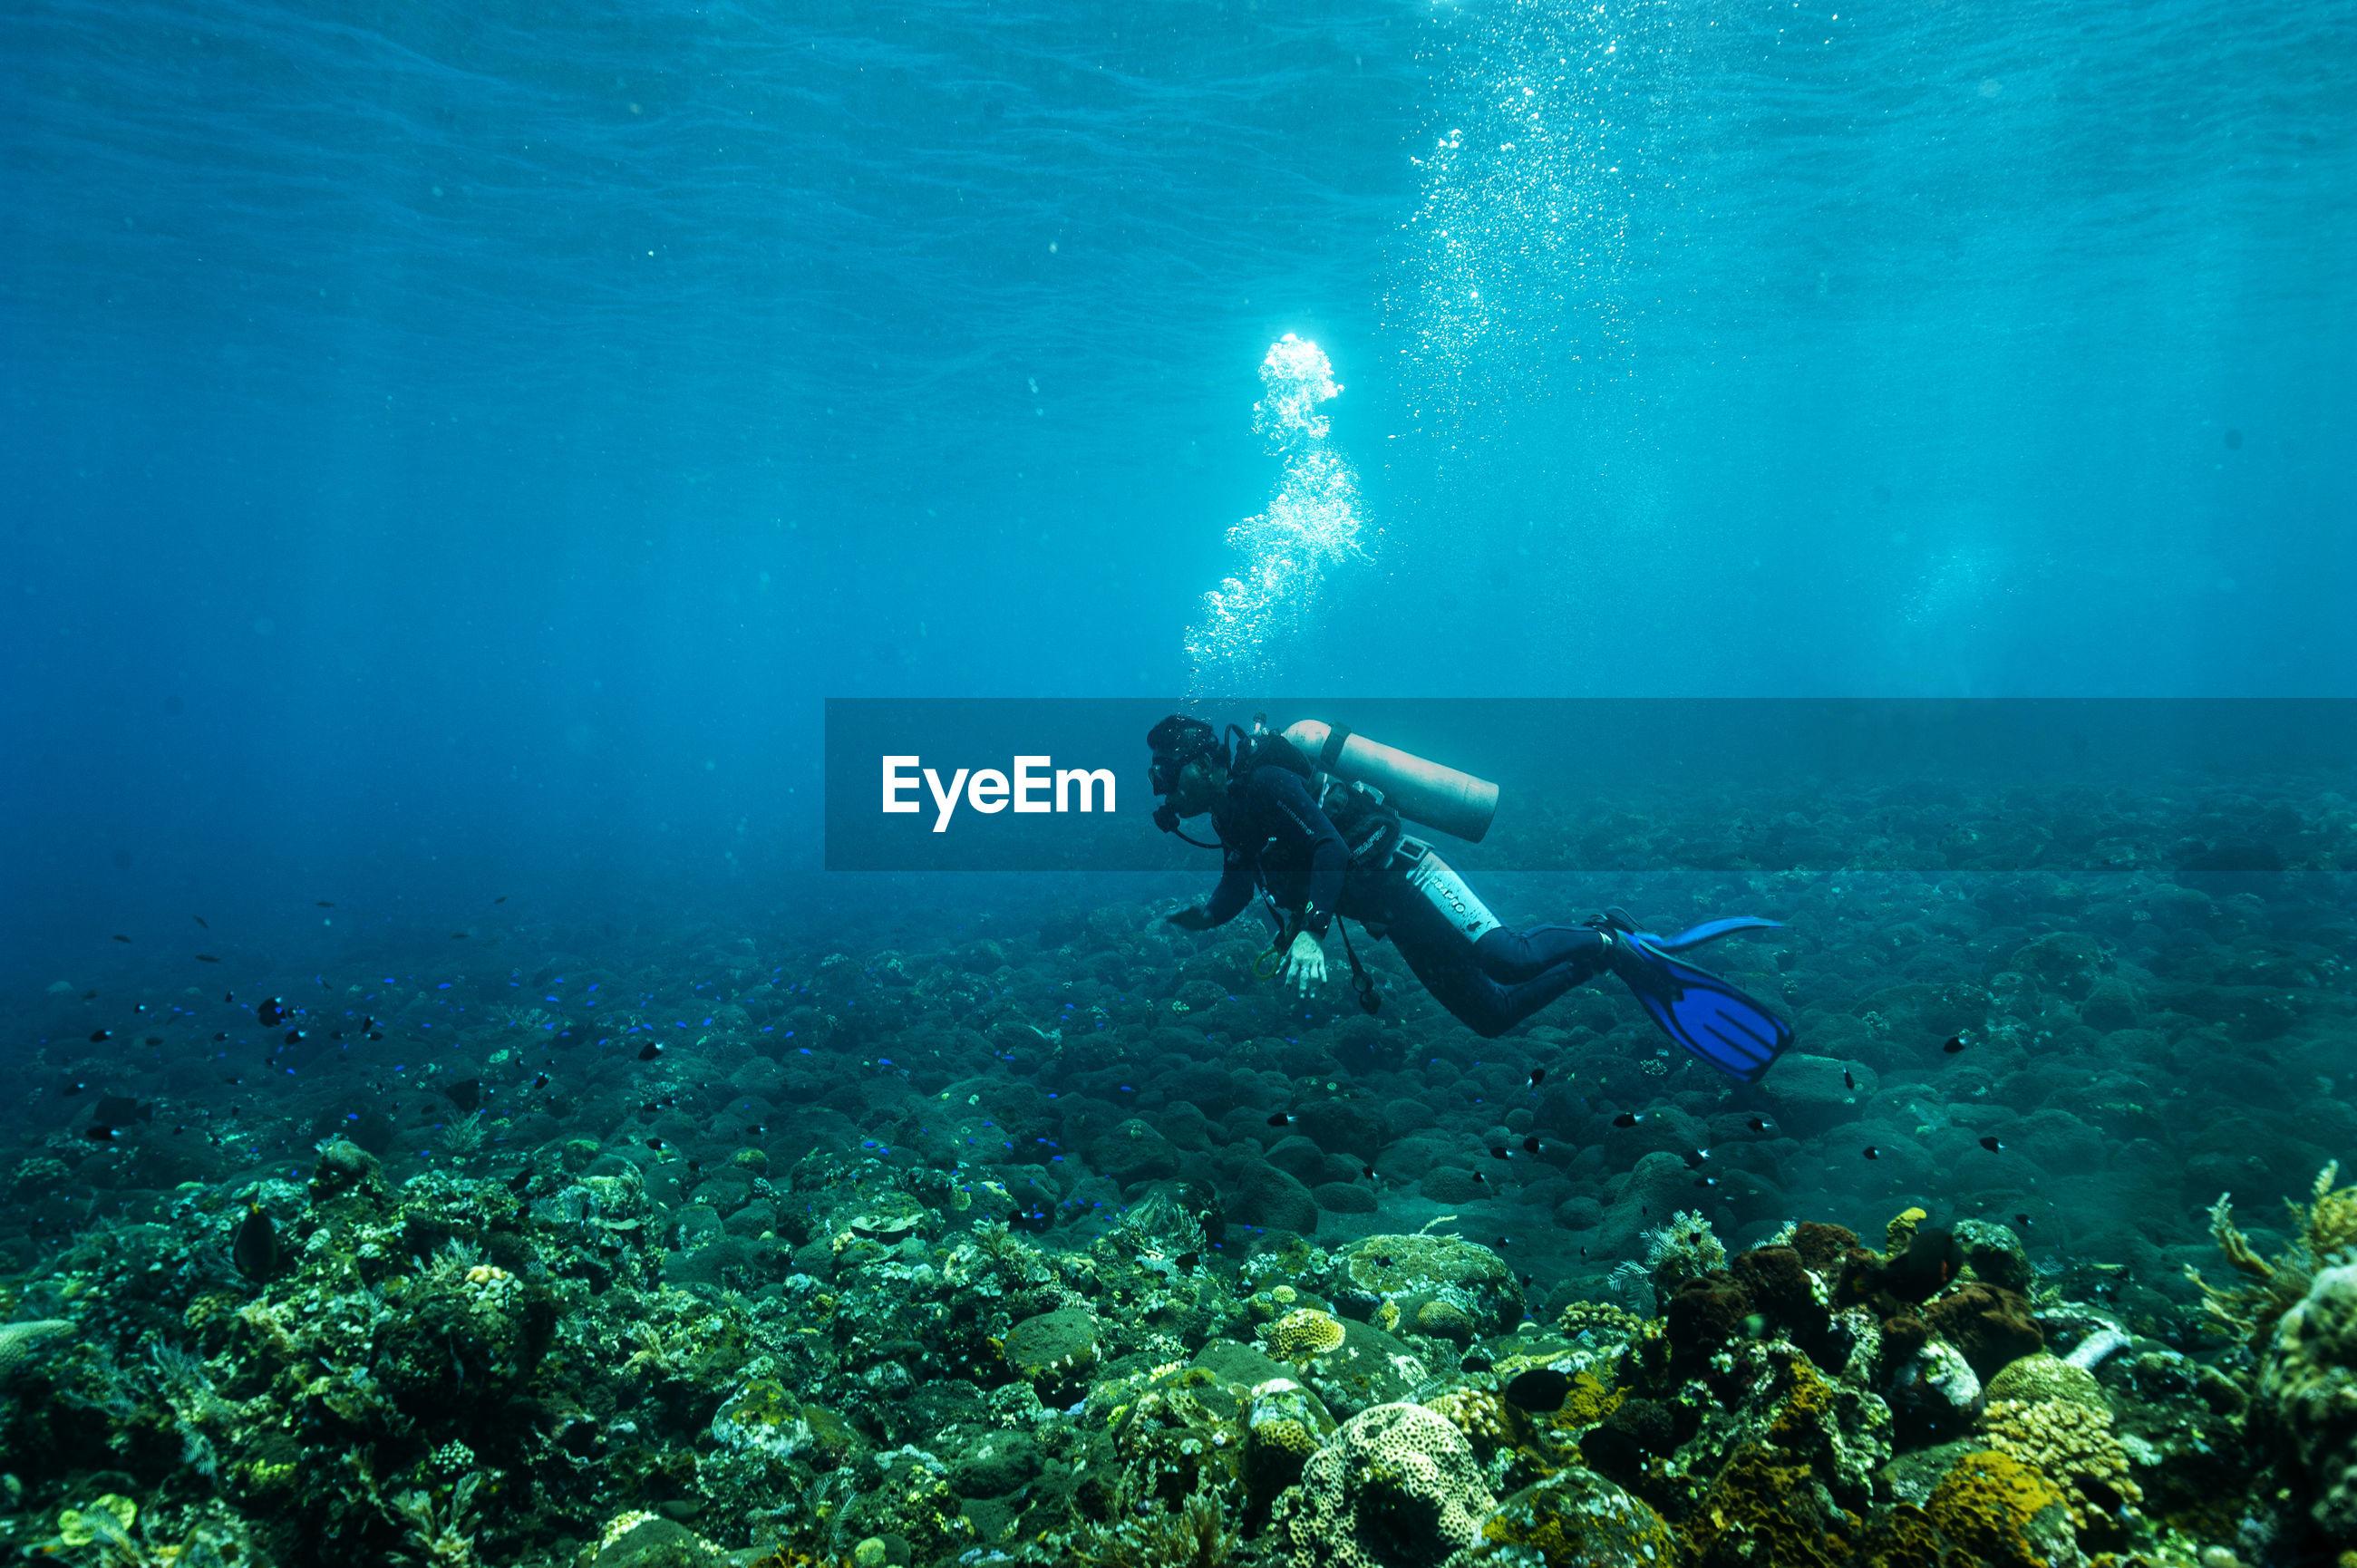 Scuba diver exploring underwater in sea